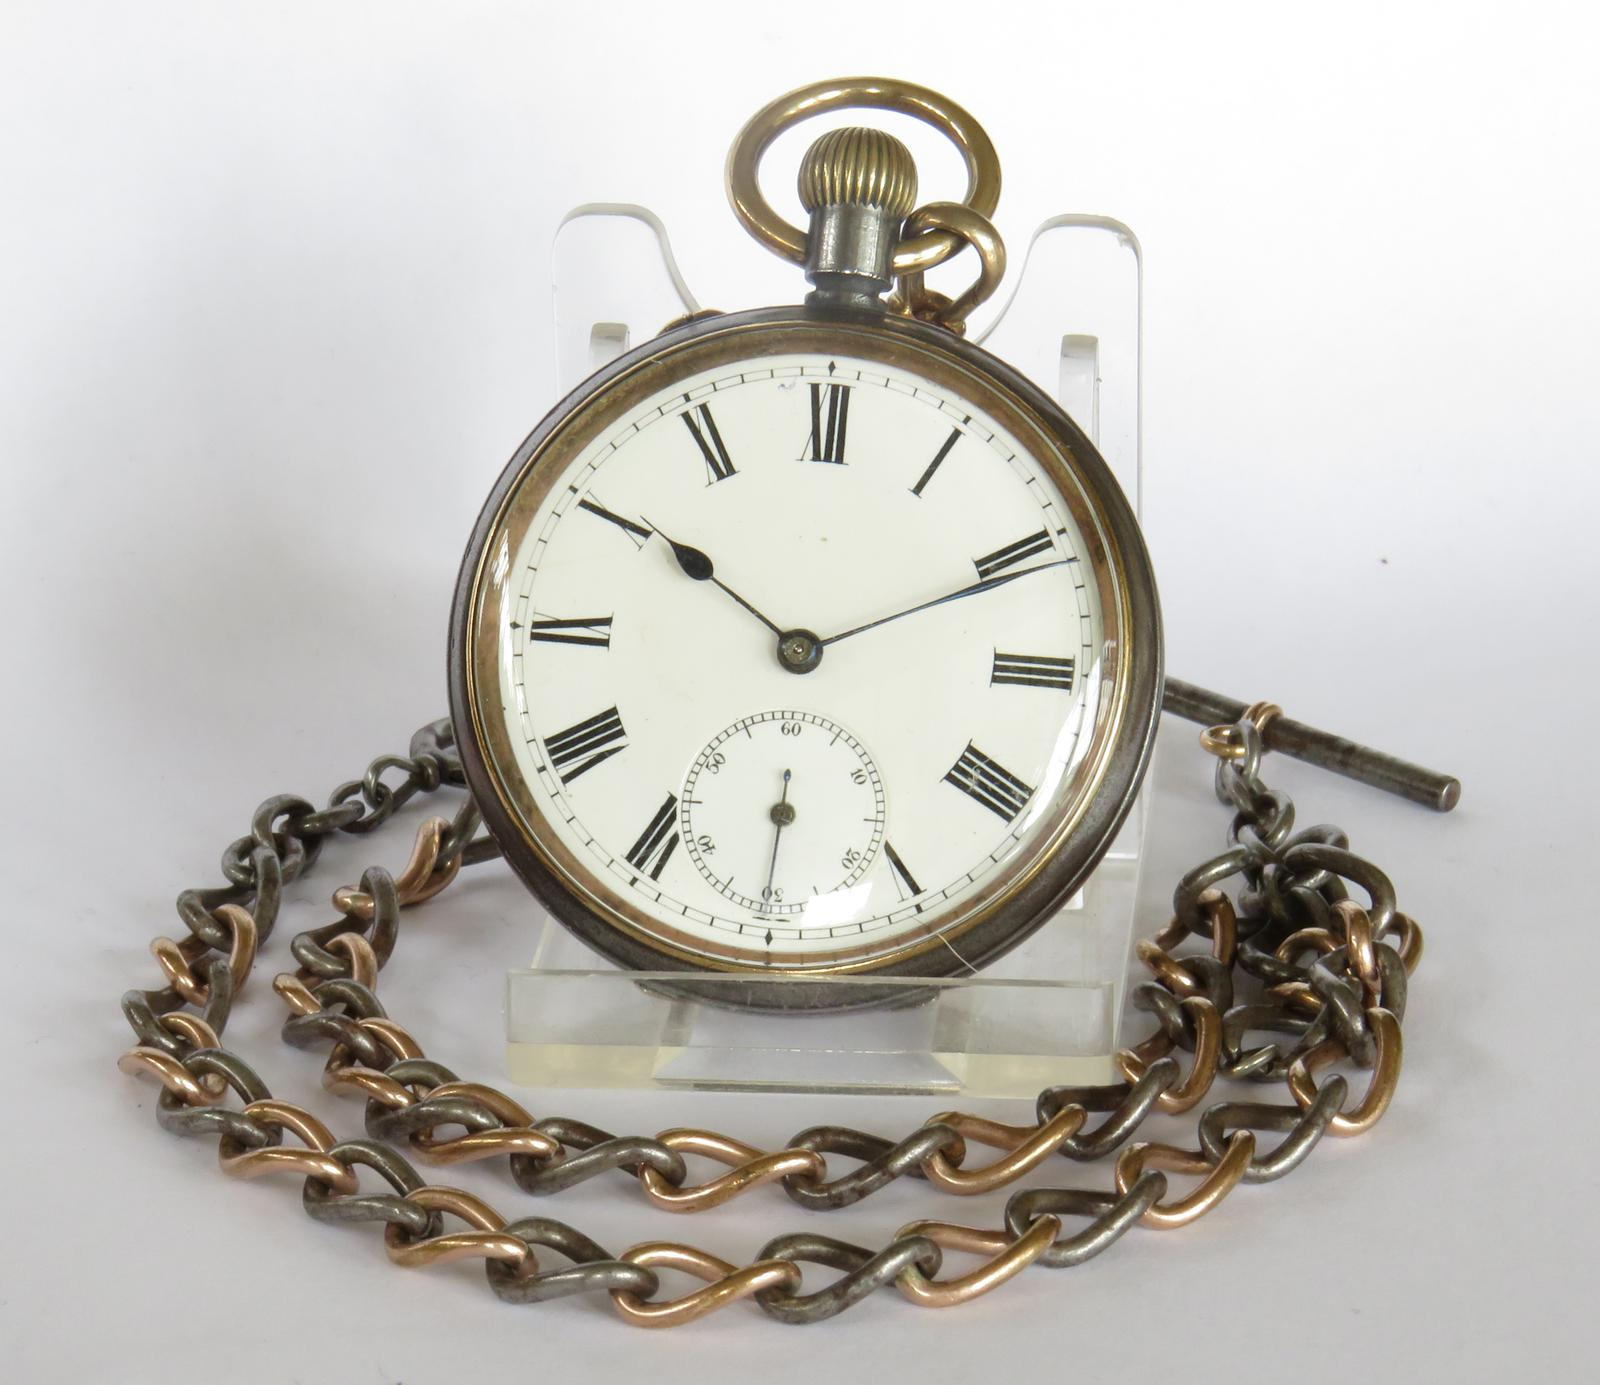 Antique Vintage Pocket Watches for Sale Online